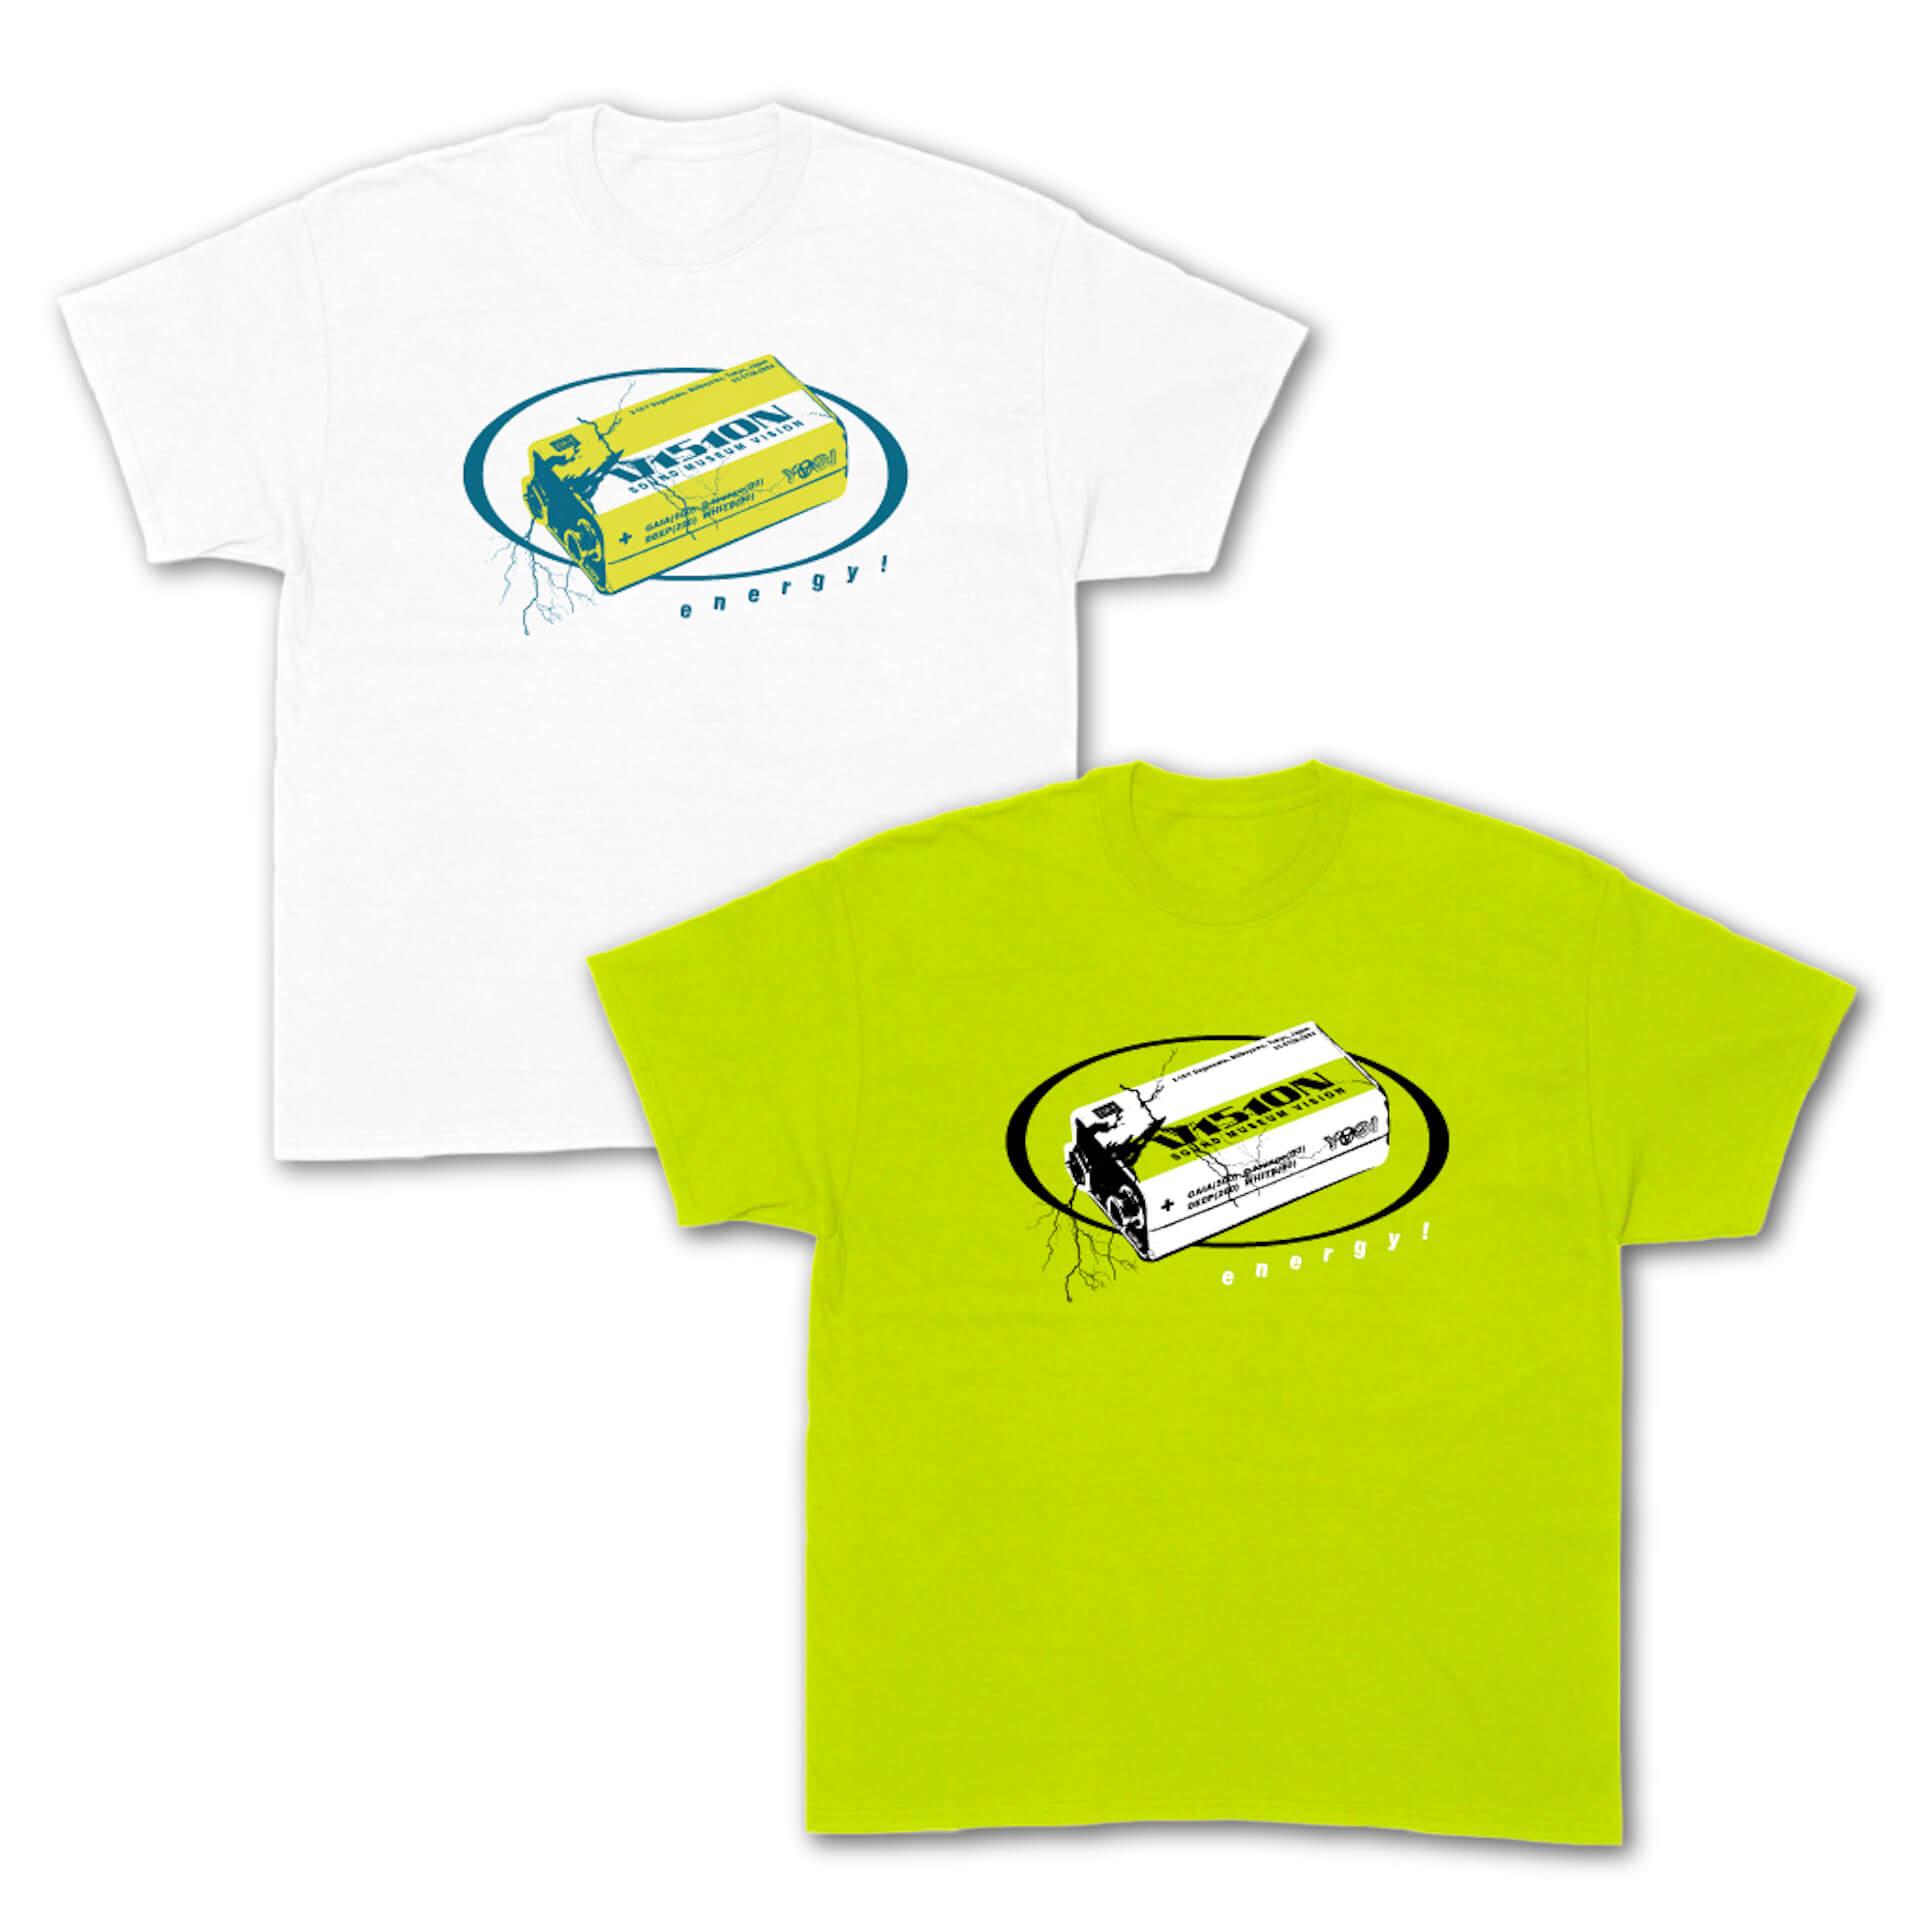 Contact Tokyo&SOUND MUSEUM VISIONのオリジナルデザインTシャツが発売決定!野村訓市、UNDERCOVER、VERDY、YAGIが参加 life210713_contact_vision_3